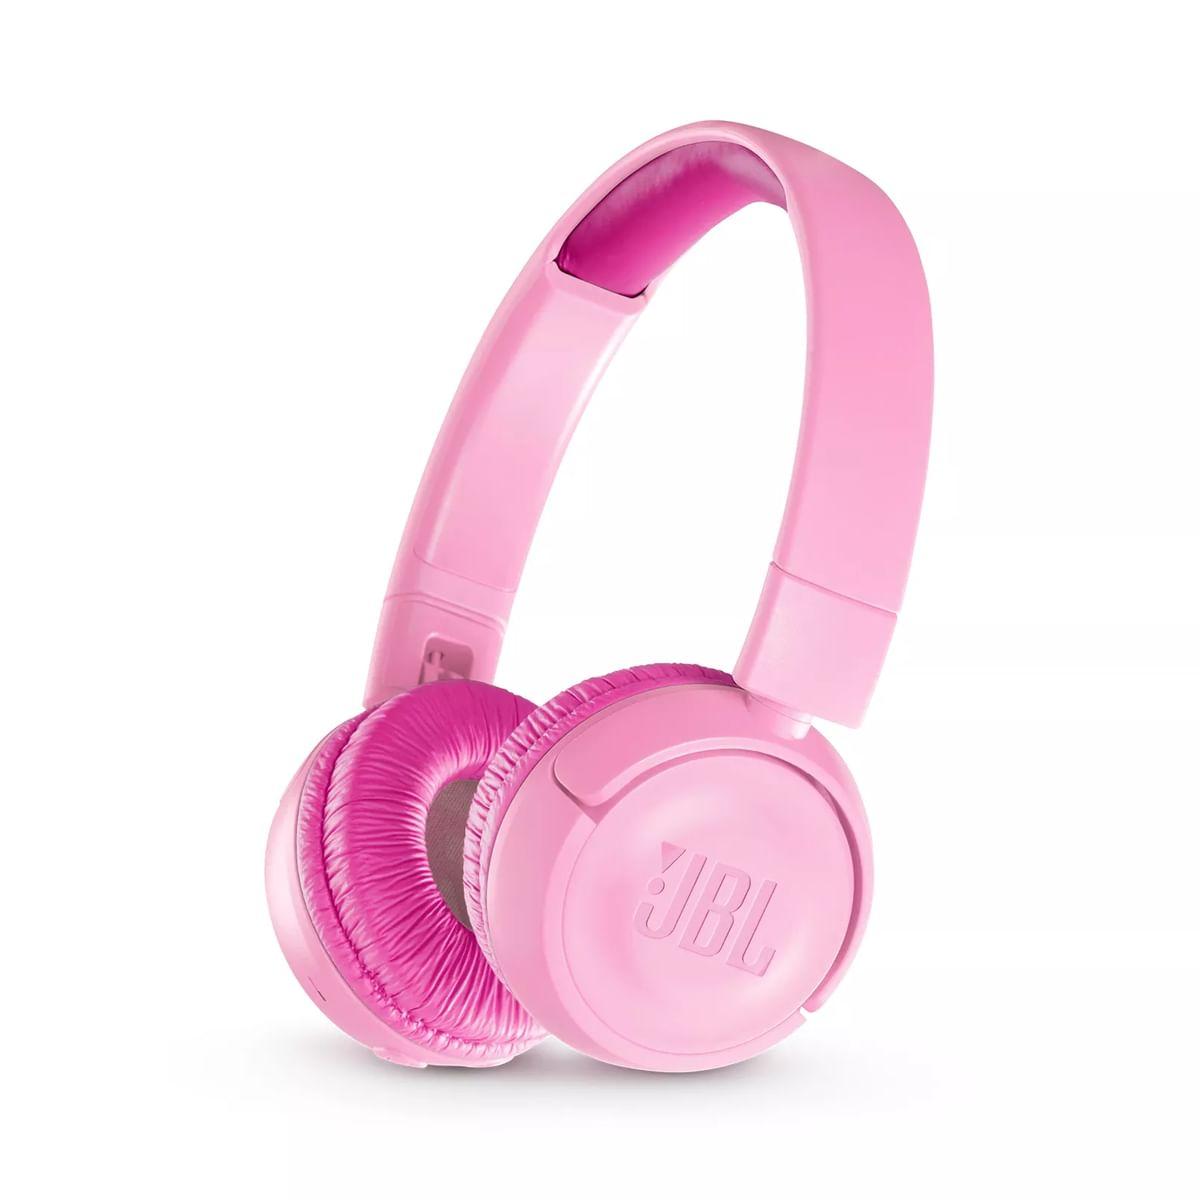 b7e77ad6b06 JBL JR300BT Kids Wireless on Ear Headphone Best Price in India 2019, Specs  & Review   Smartprix